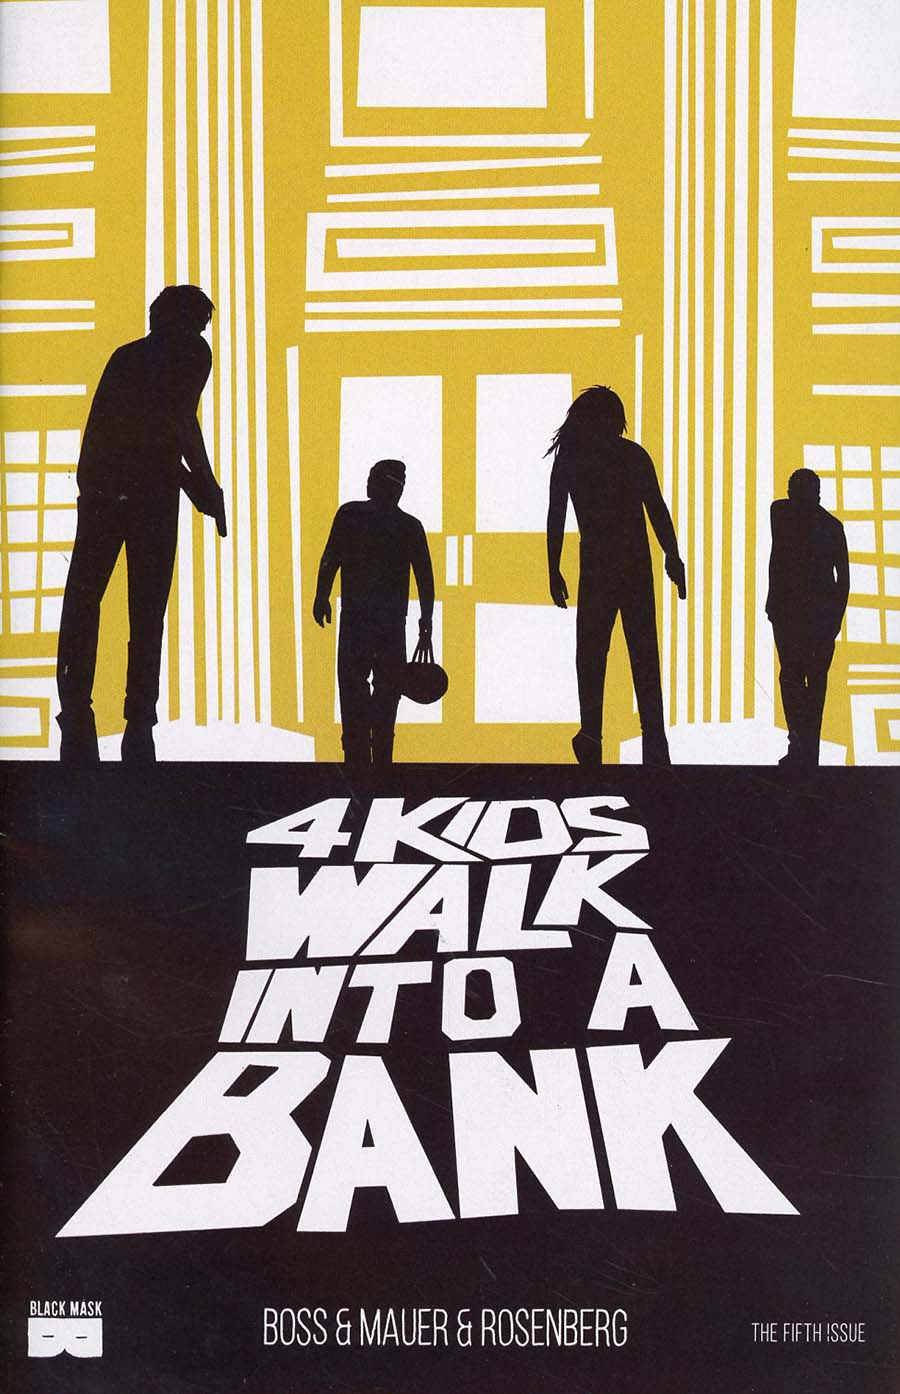 4 Kids Walk Into a Bank 5